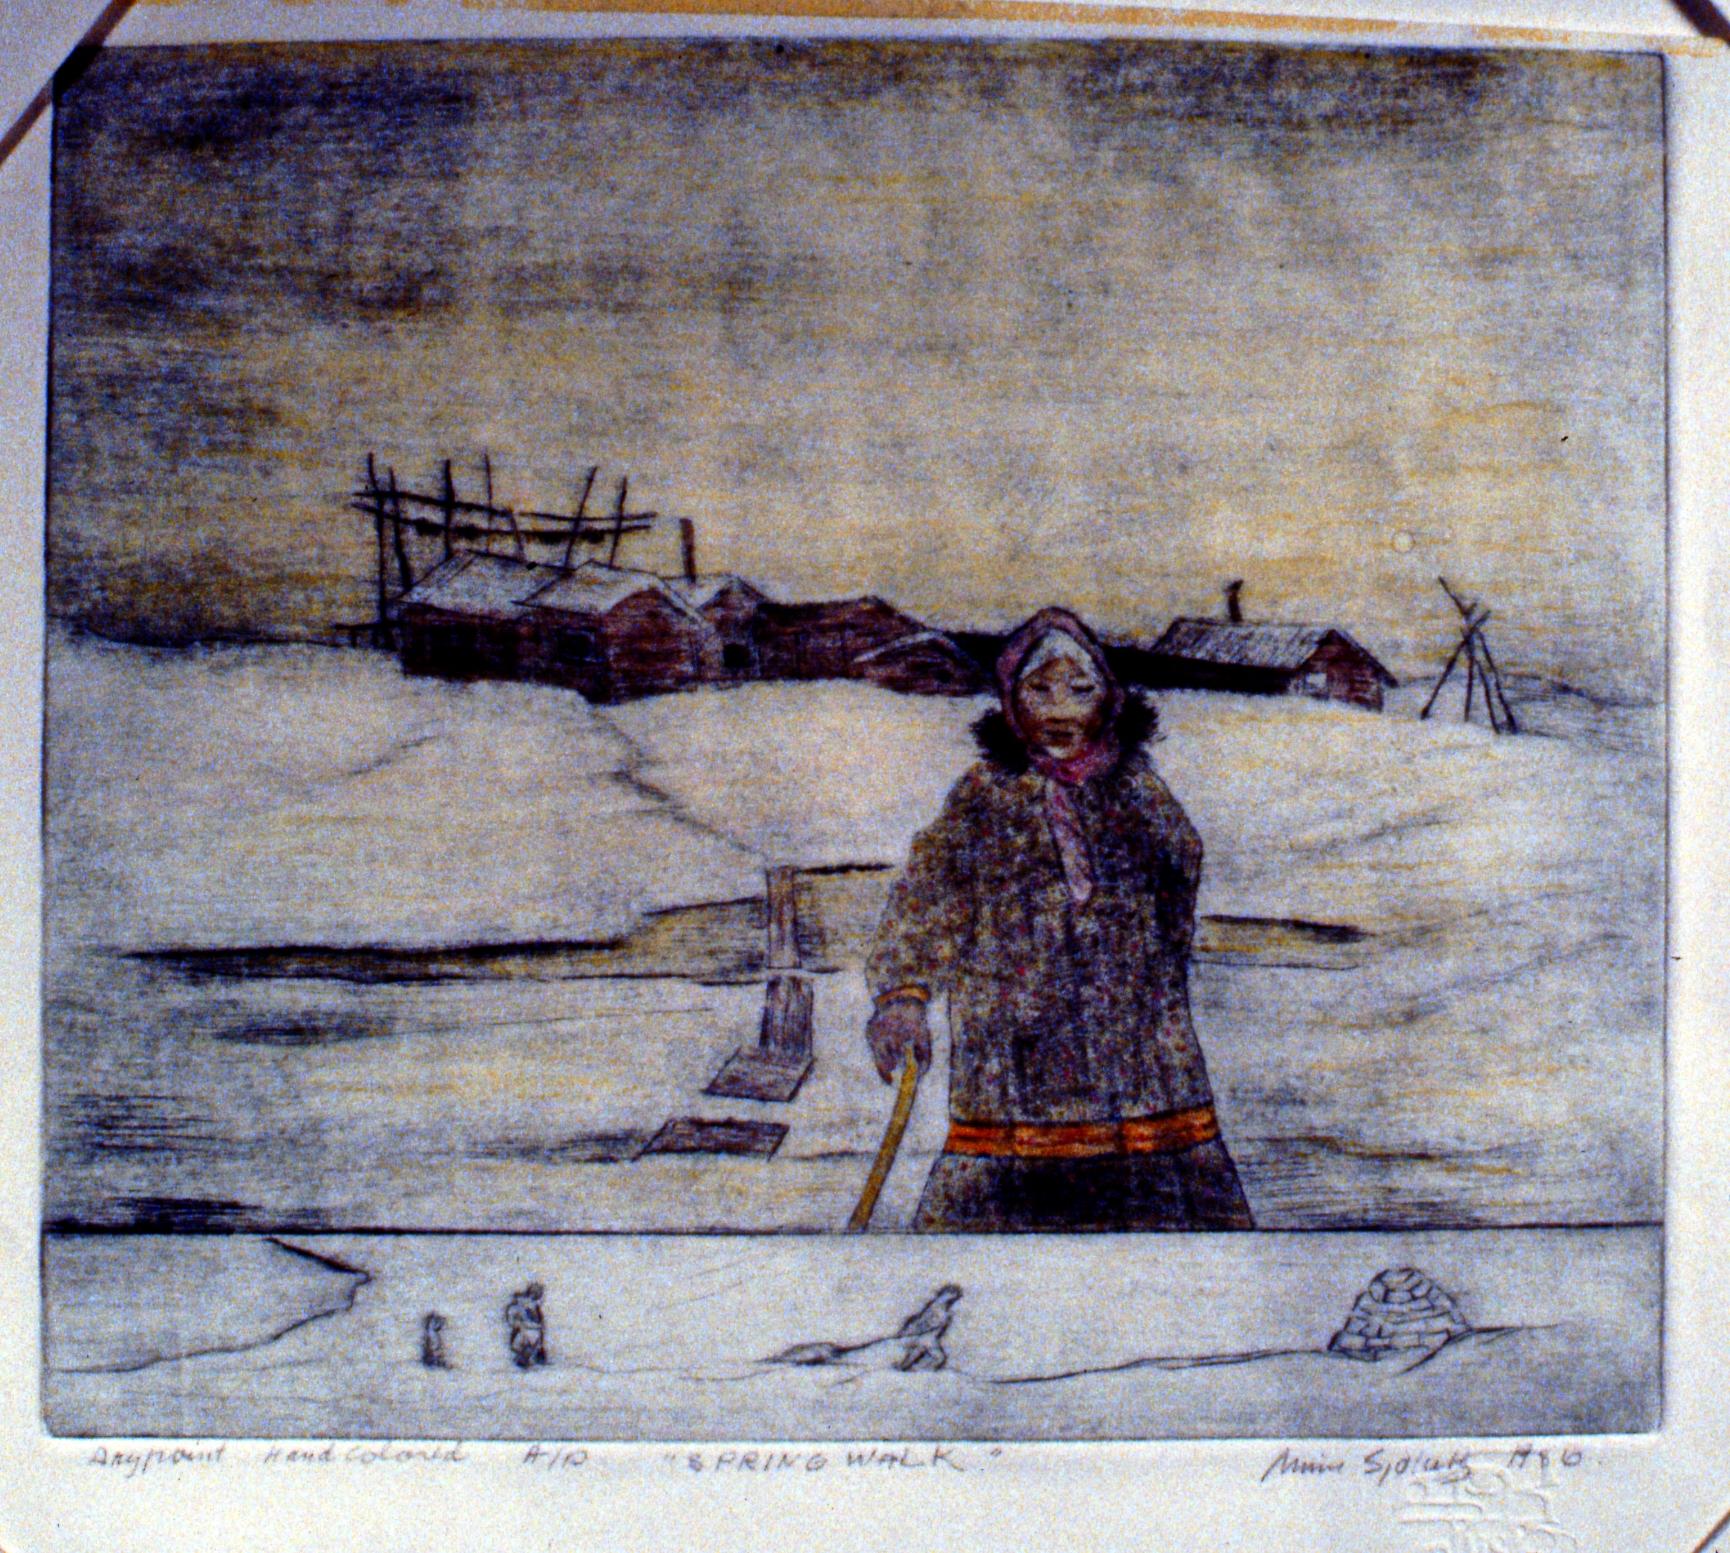 Spring Walk , 1986, Minn Sjølseth, hand-coloured dry point, 21.5 x 25.5 cm, 1996.02.24